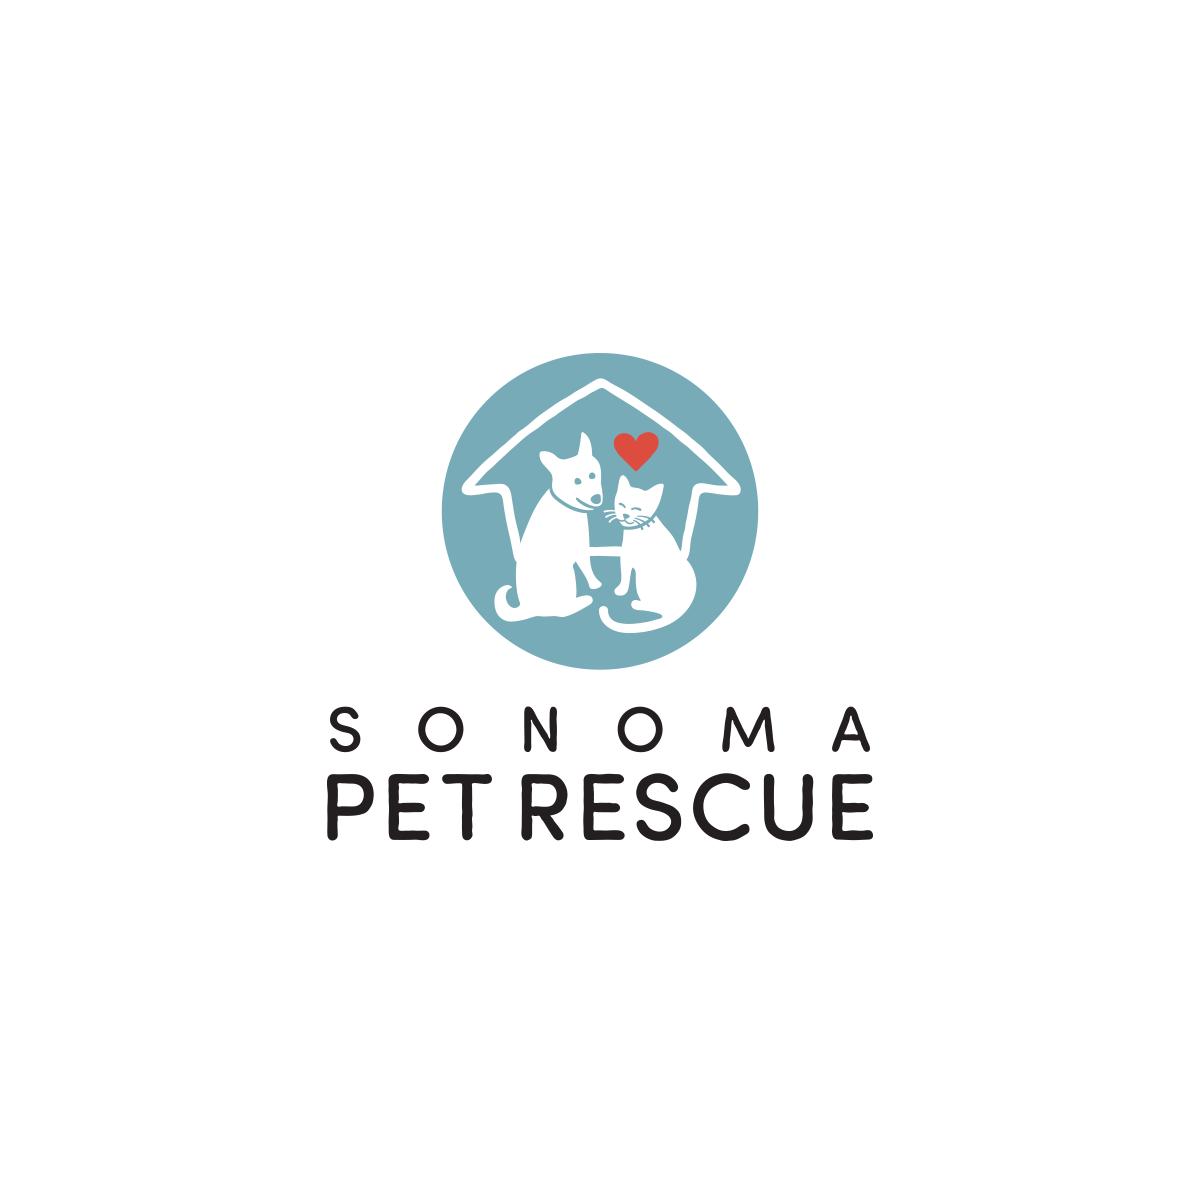 Sonoma Pet Rescue